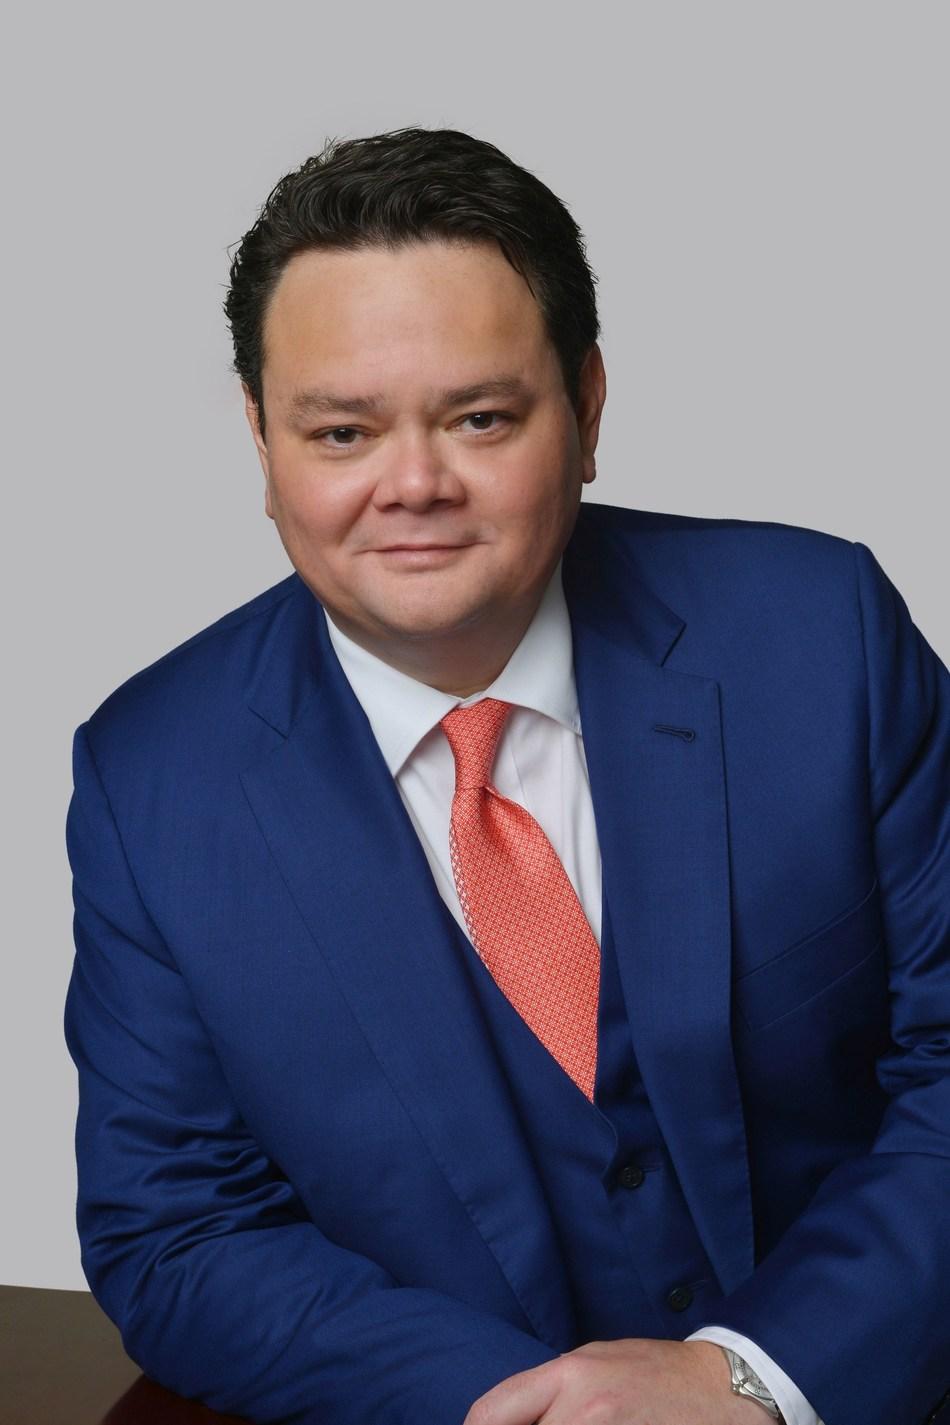 Sean Kearney - Chief Operating Officer (PRNewsFoto/Greenstone Equity Partners)